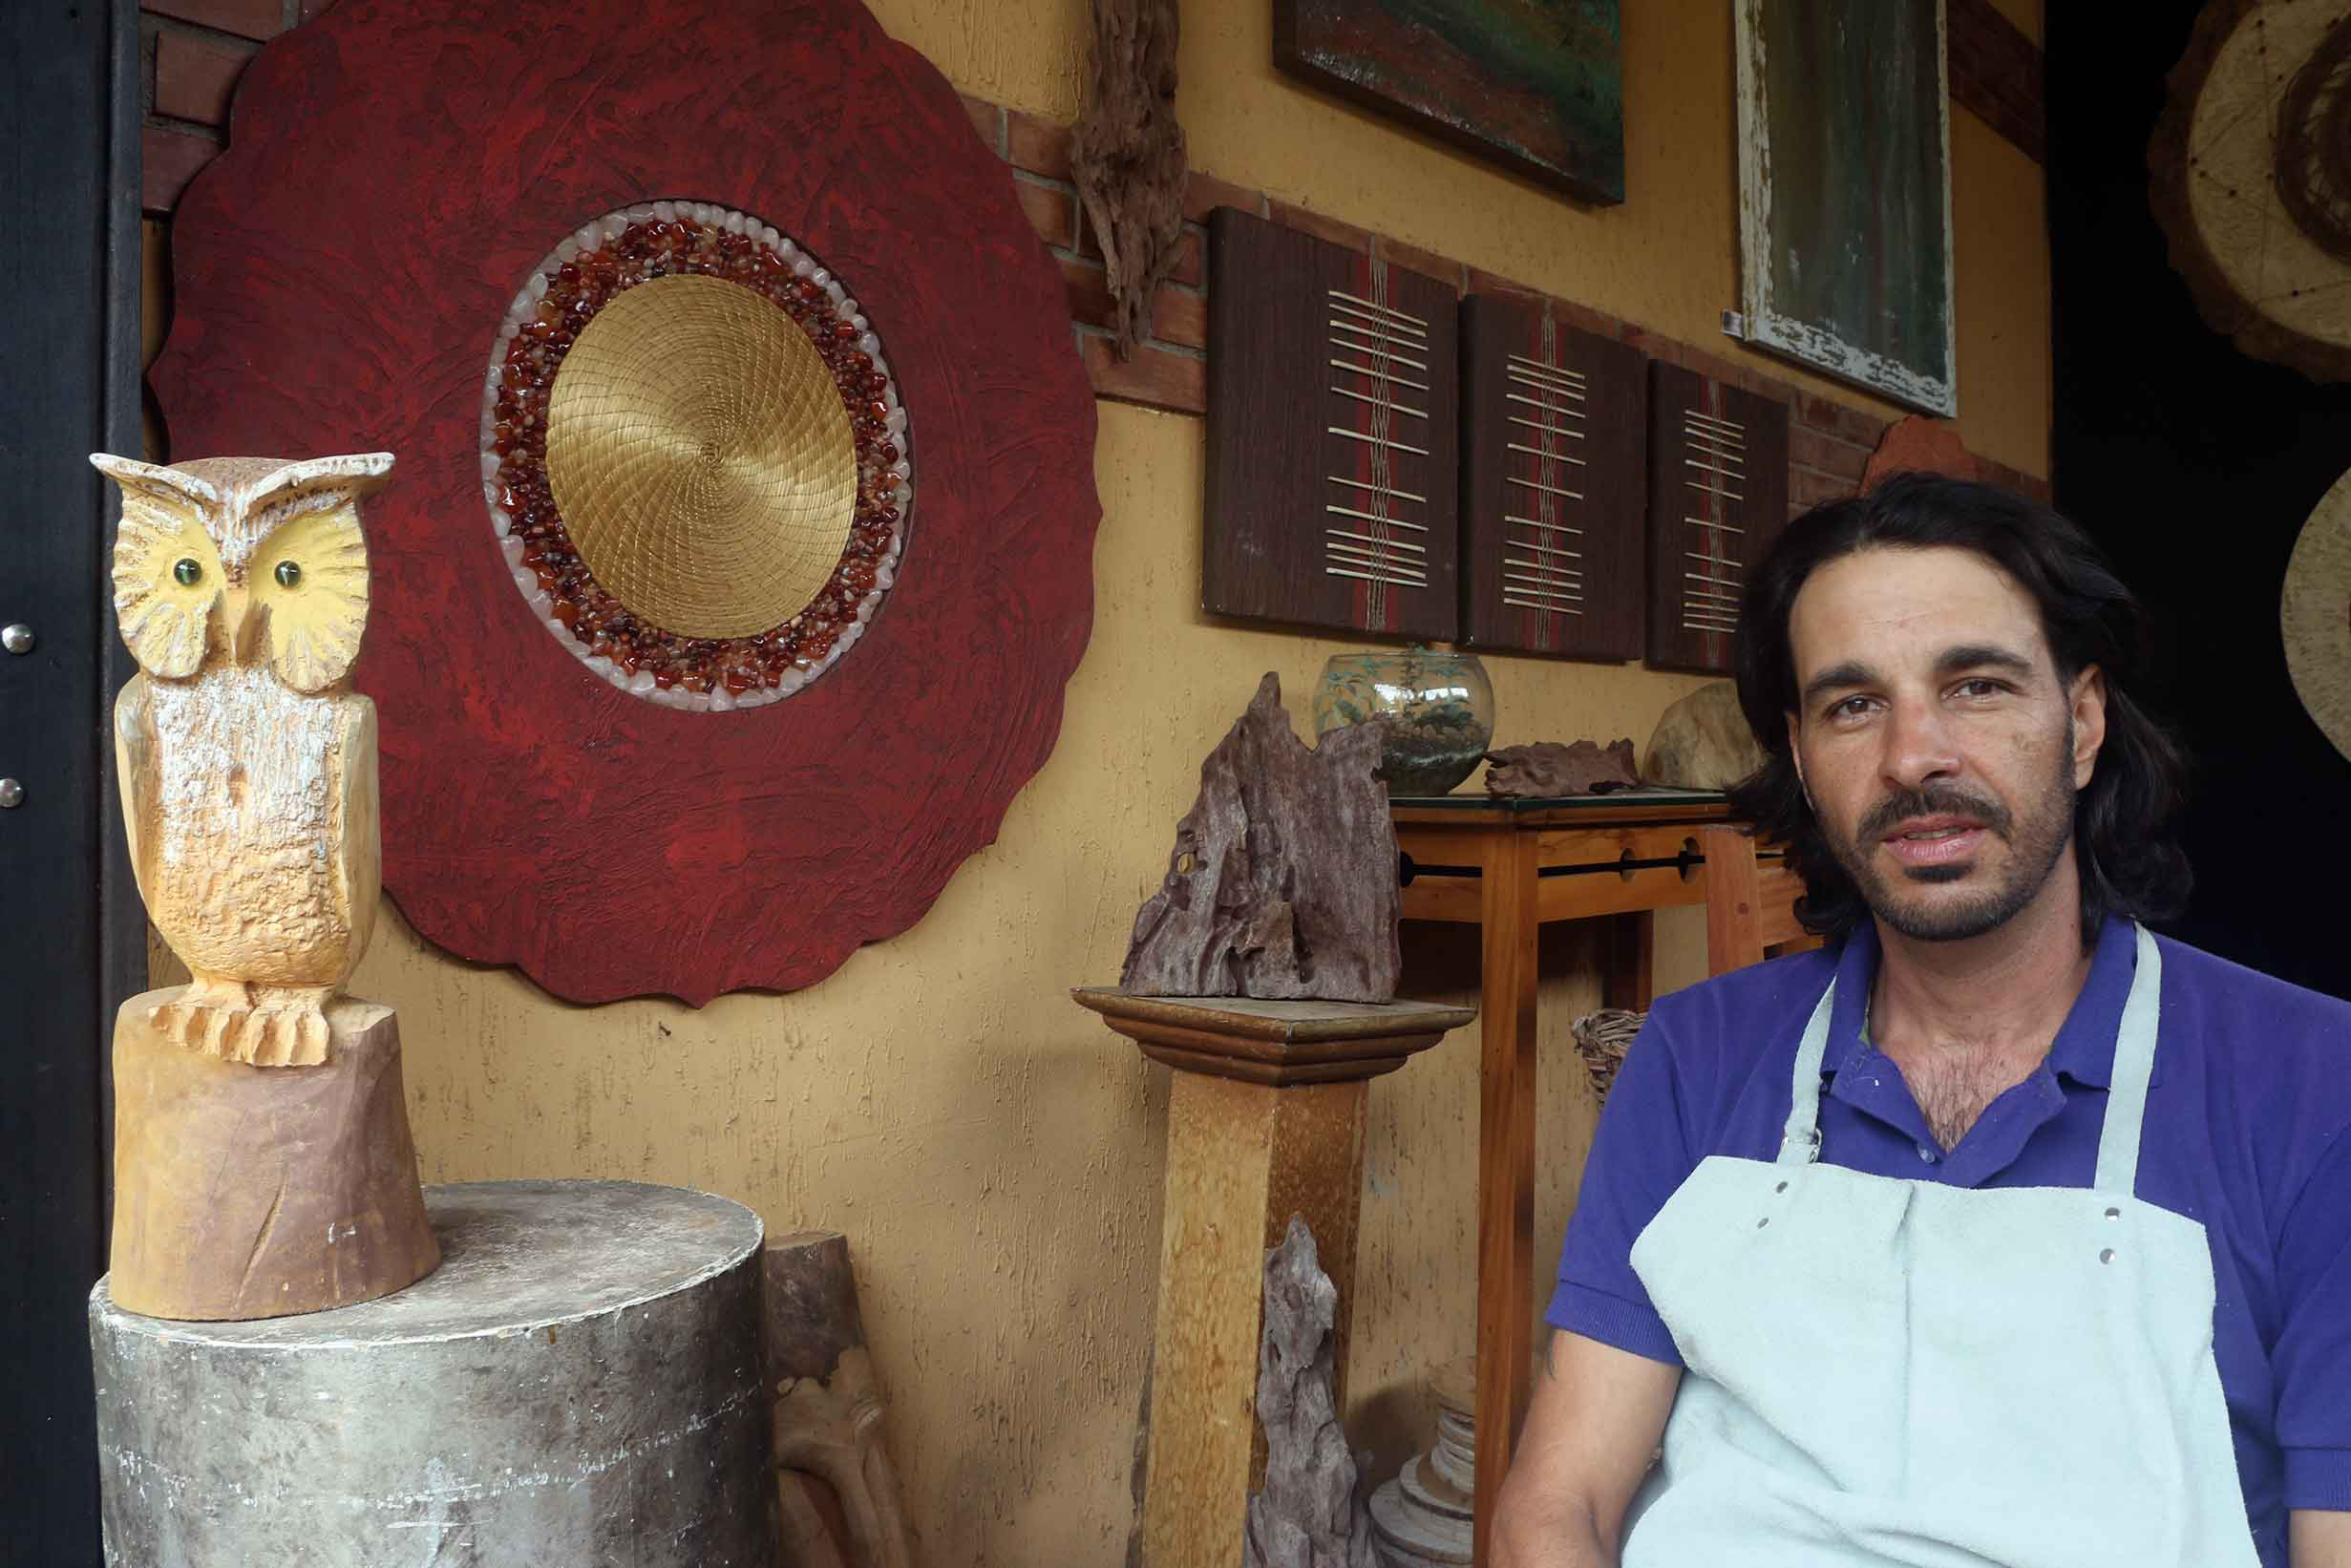 Visconde-de-Maua-Artes-Fabio-Genovesi-pedras-sementes-fibras-bx